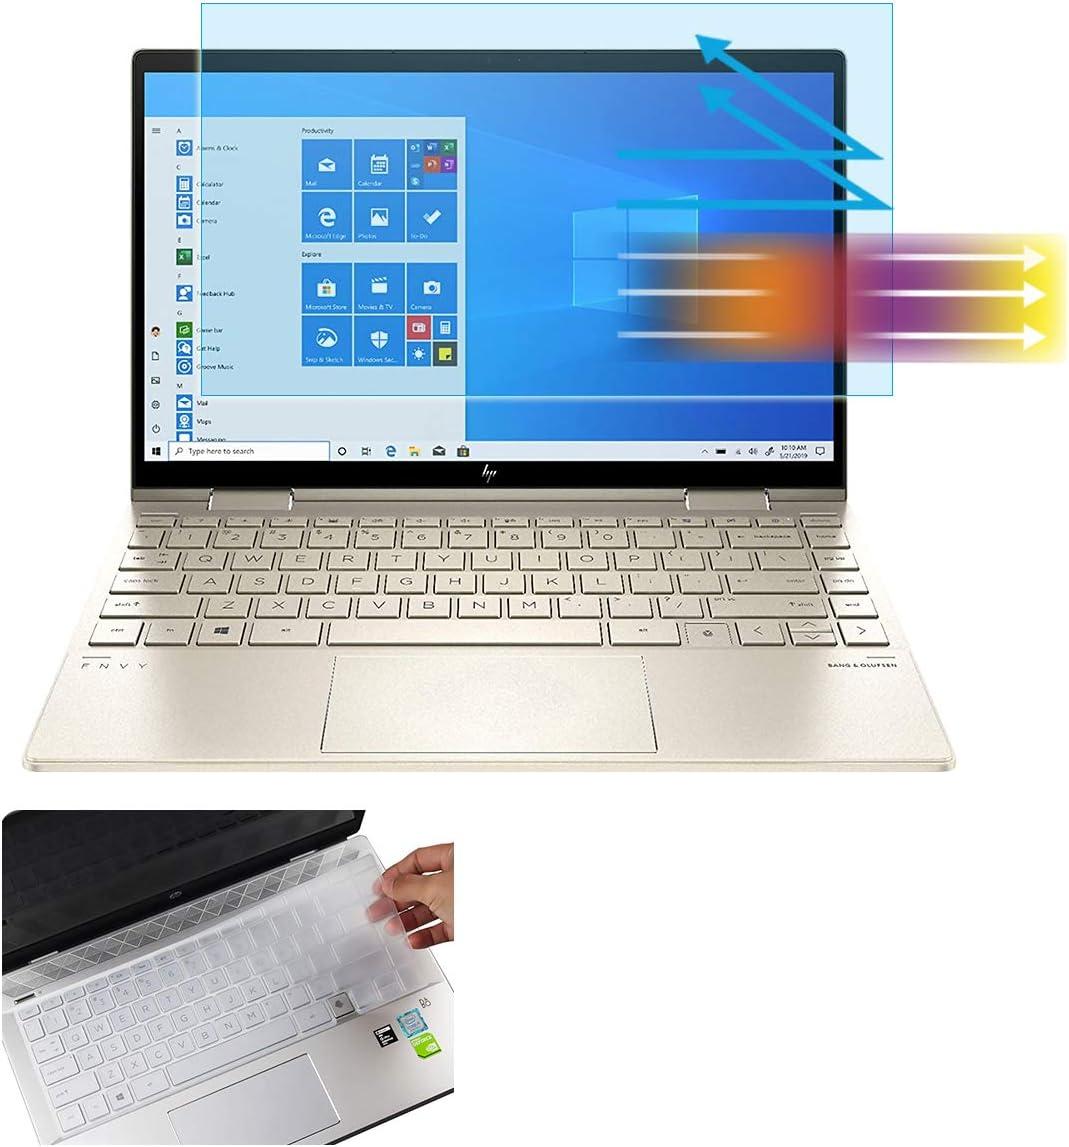 AntiBlueLightScreenProtectorKeyboardCoverDesignfor13.3